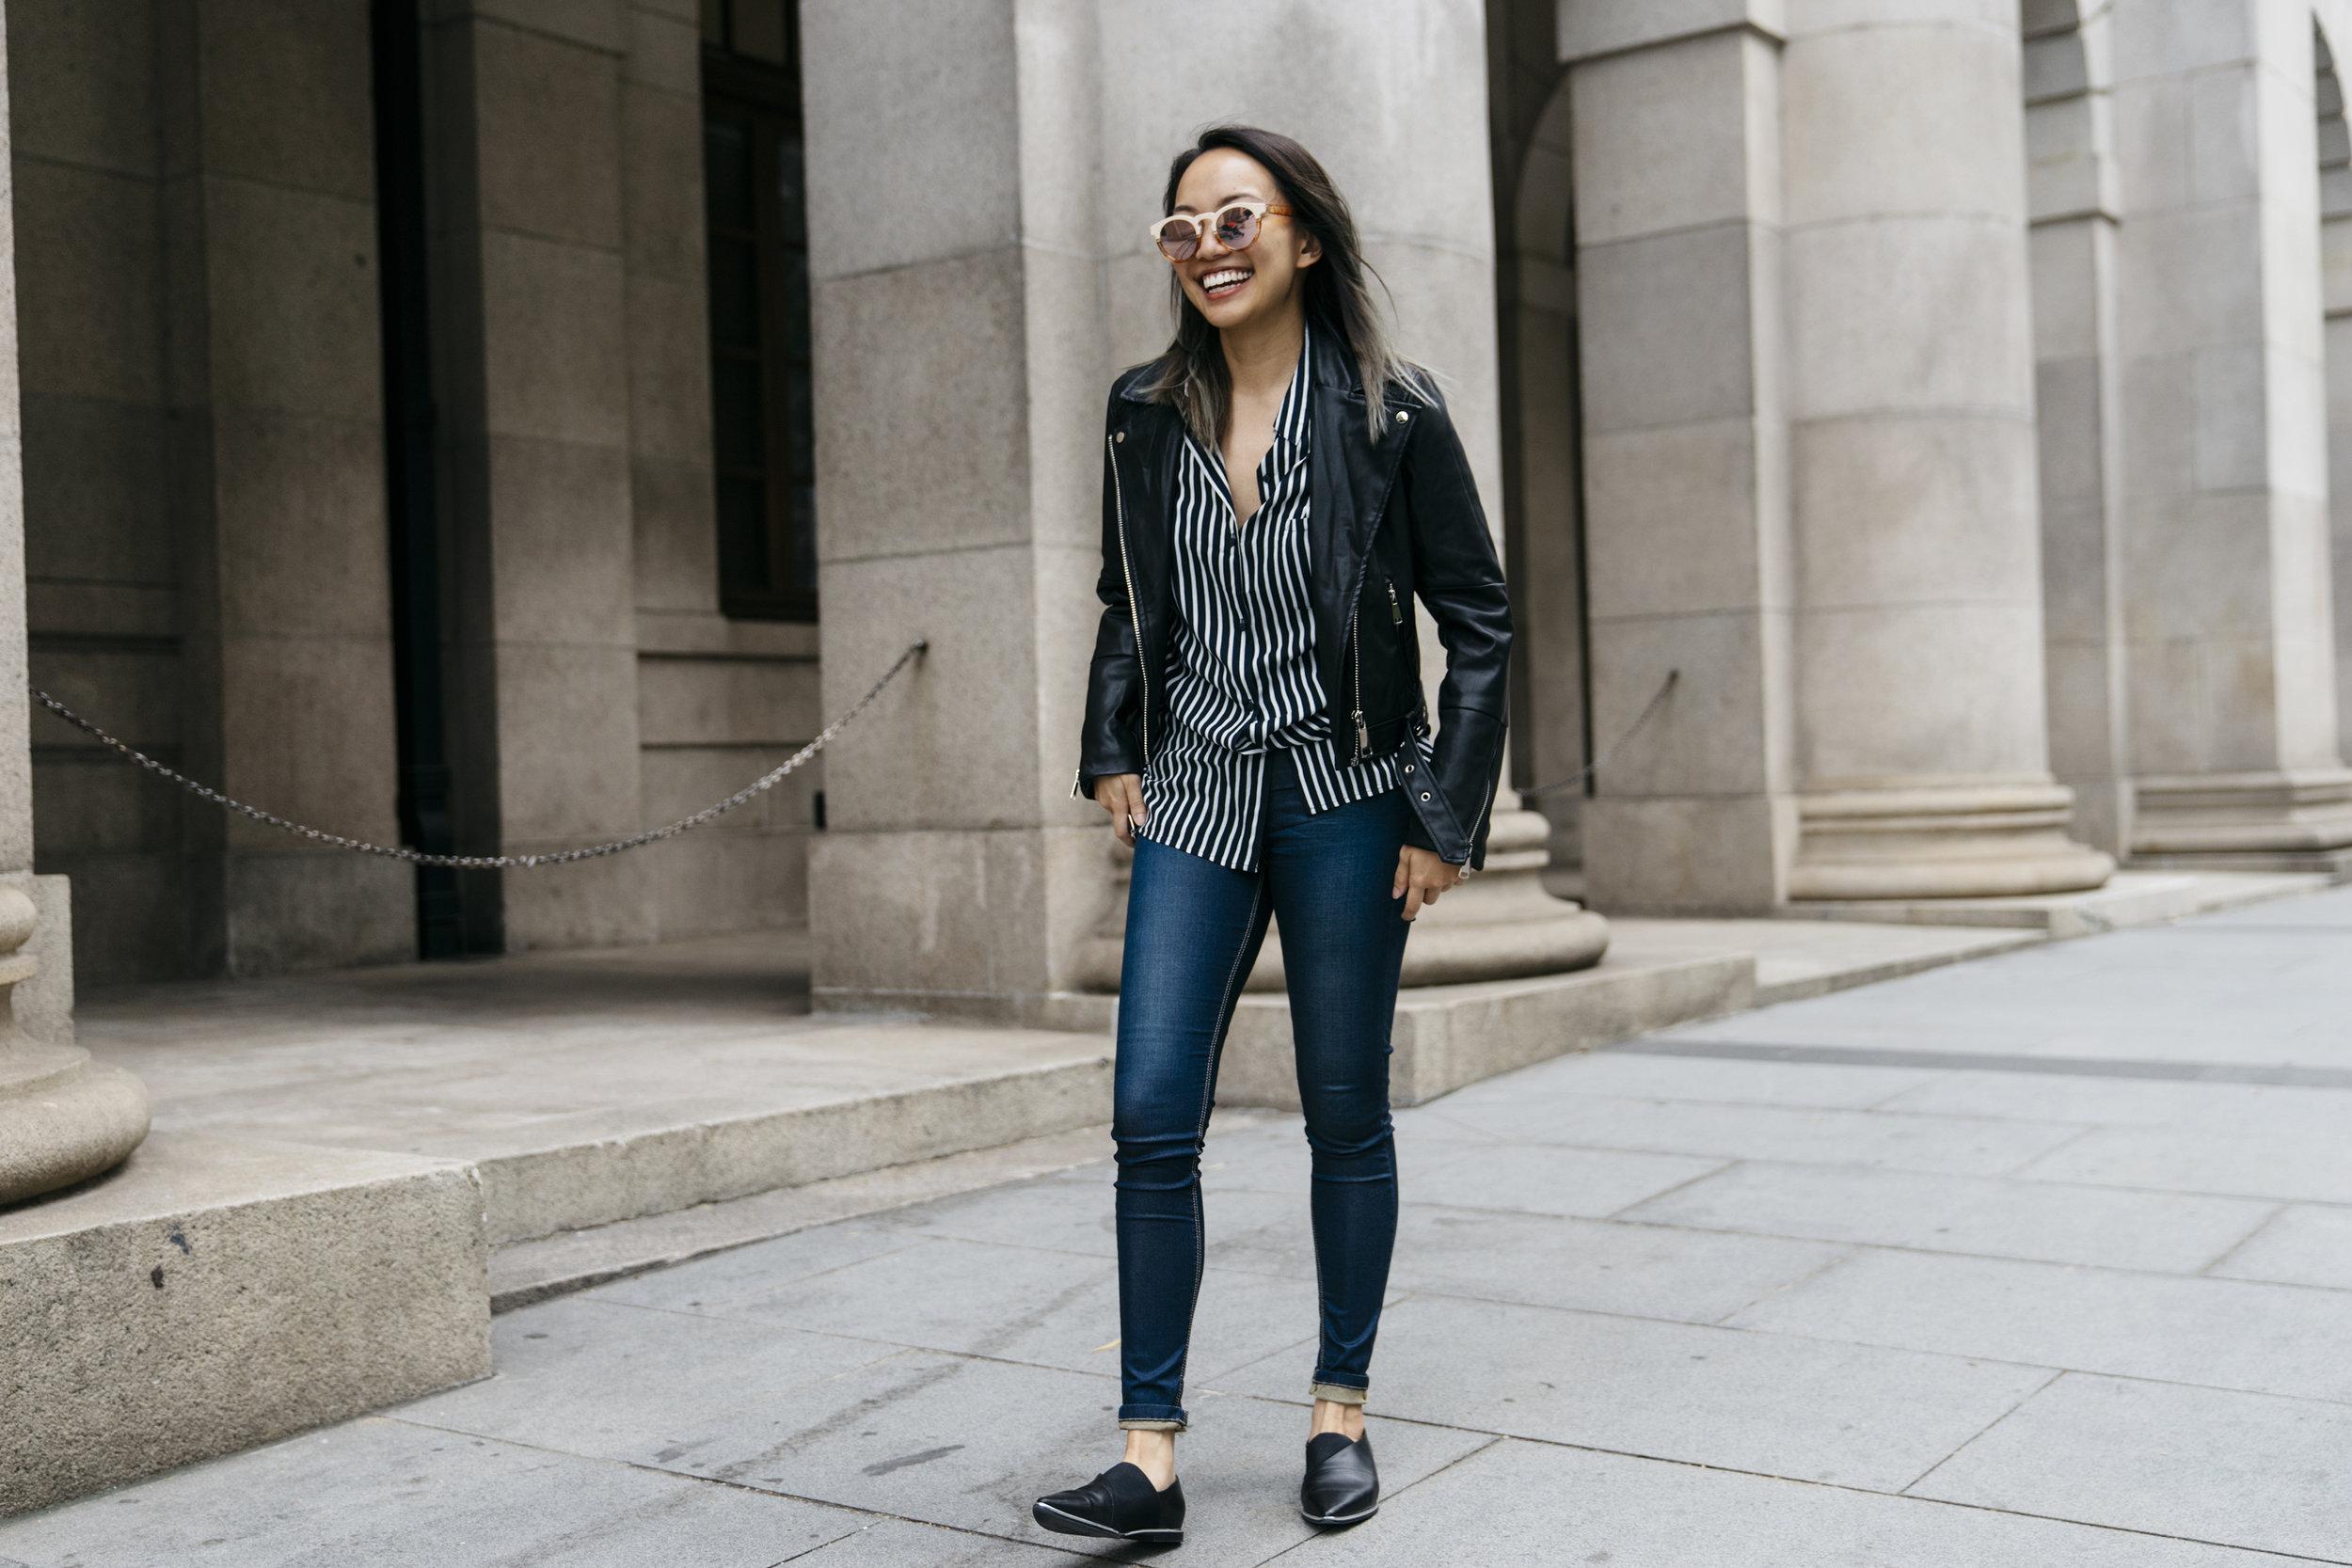 hey-yeh-pomelo-fashion-striped-leather-jacket.jpg